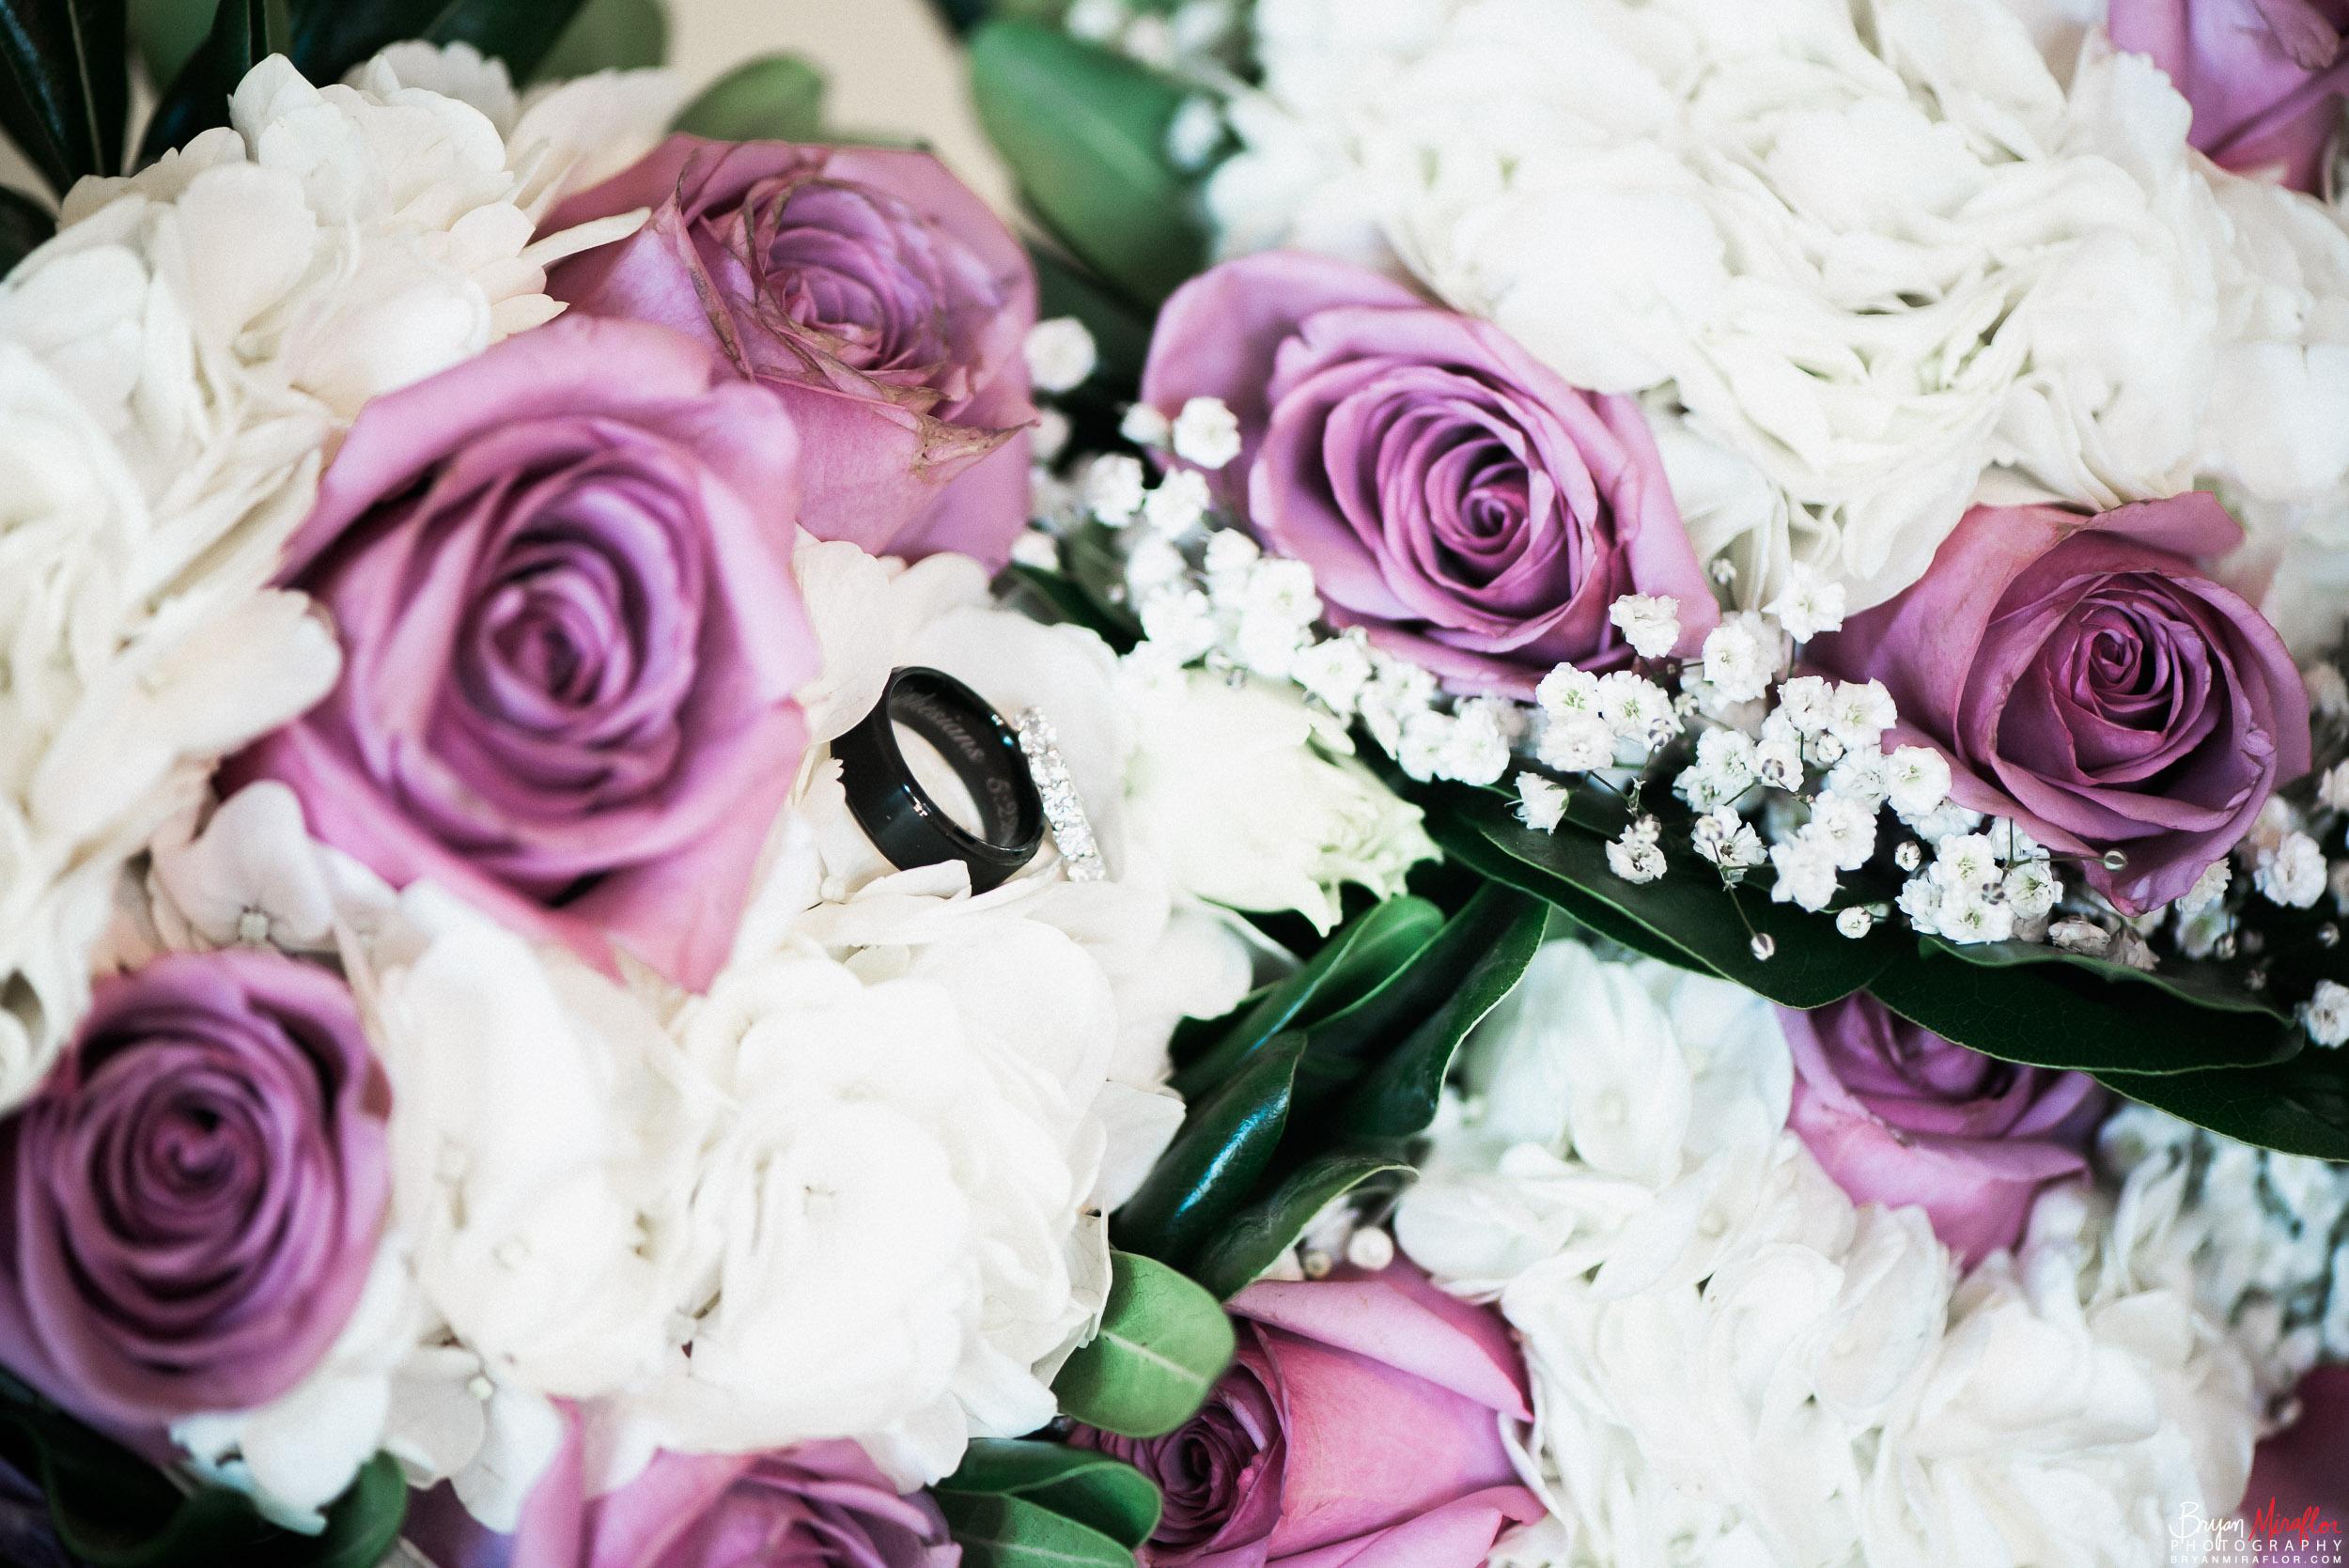 Bryan-Miraflor-Photography-Trisha-Dexter-Married-20170923-004.jpg